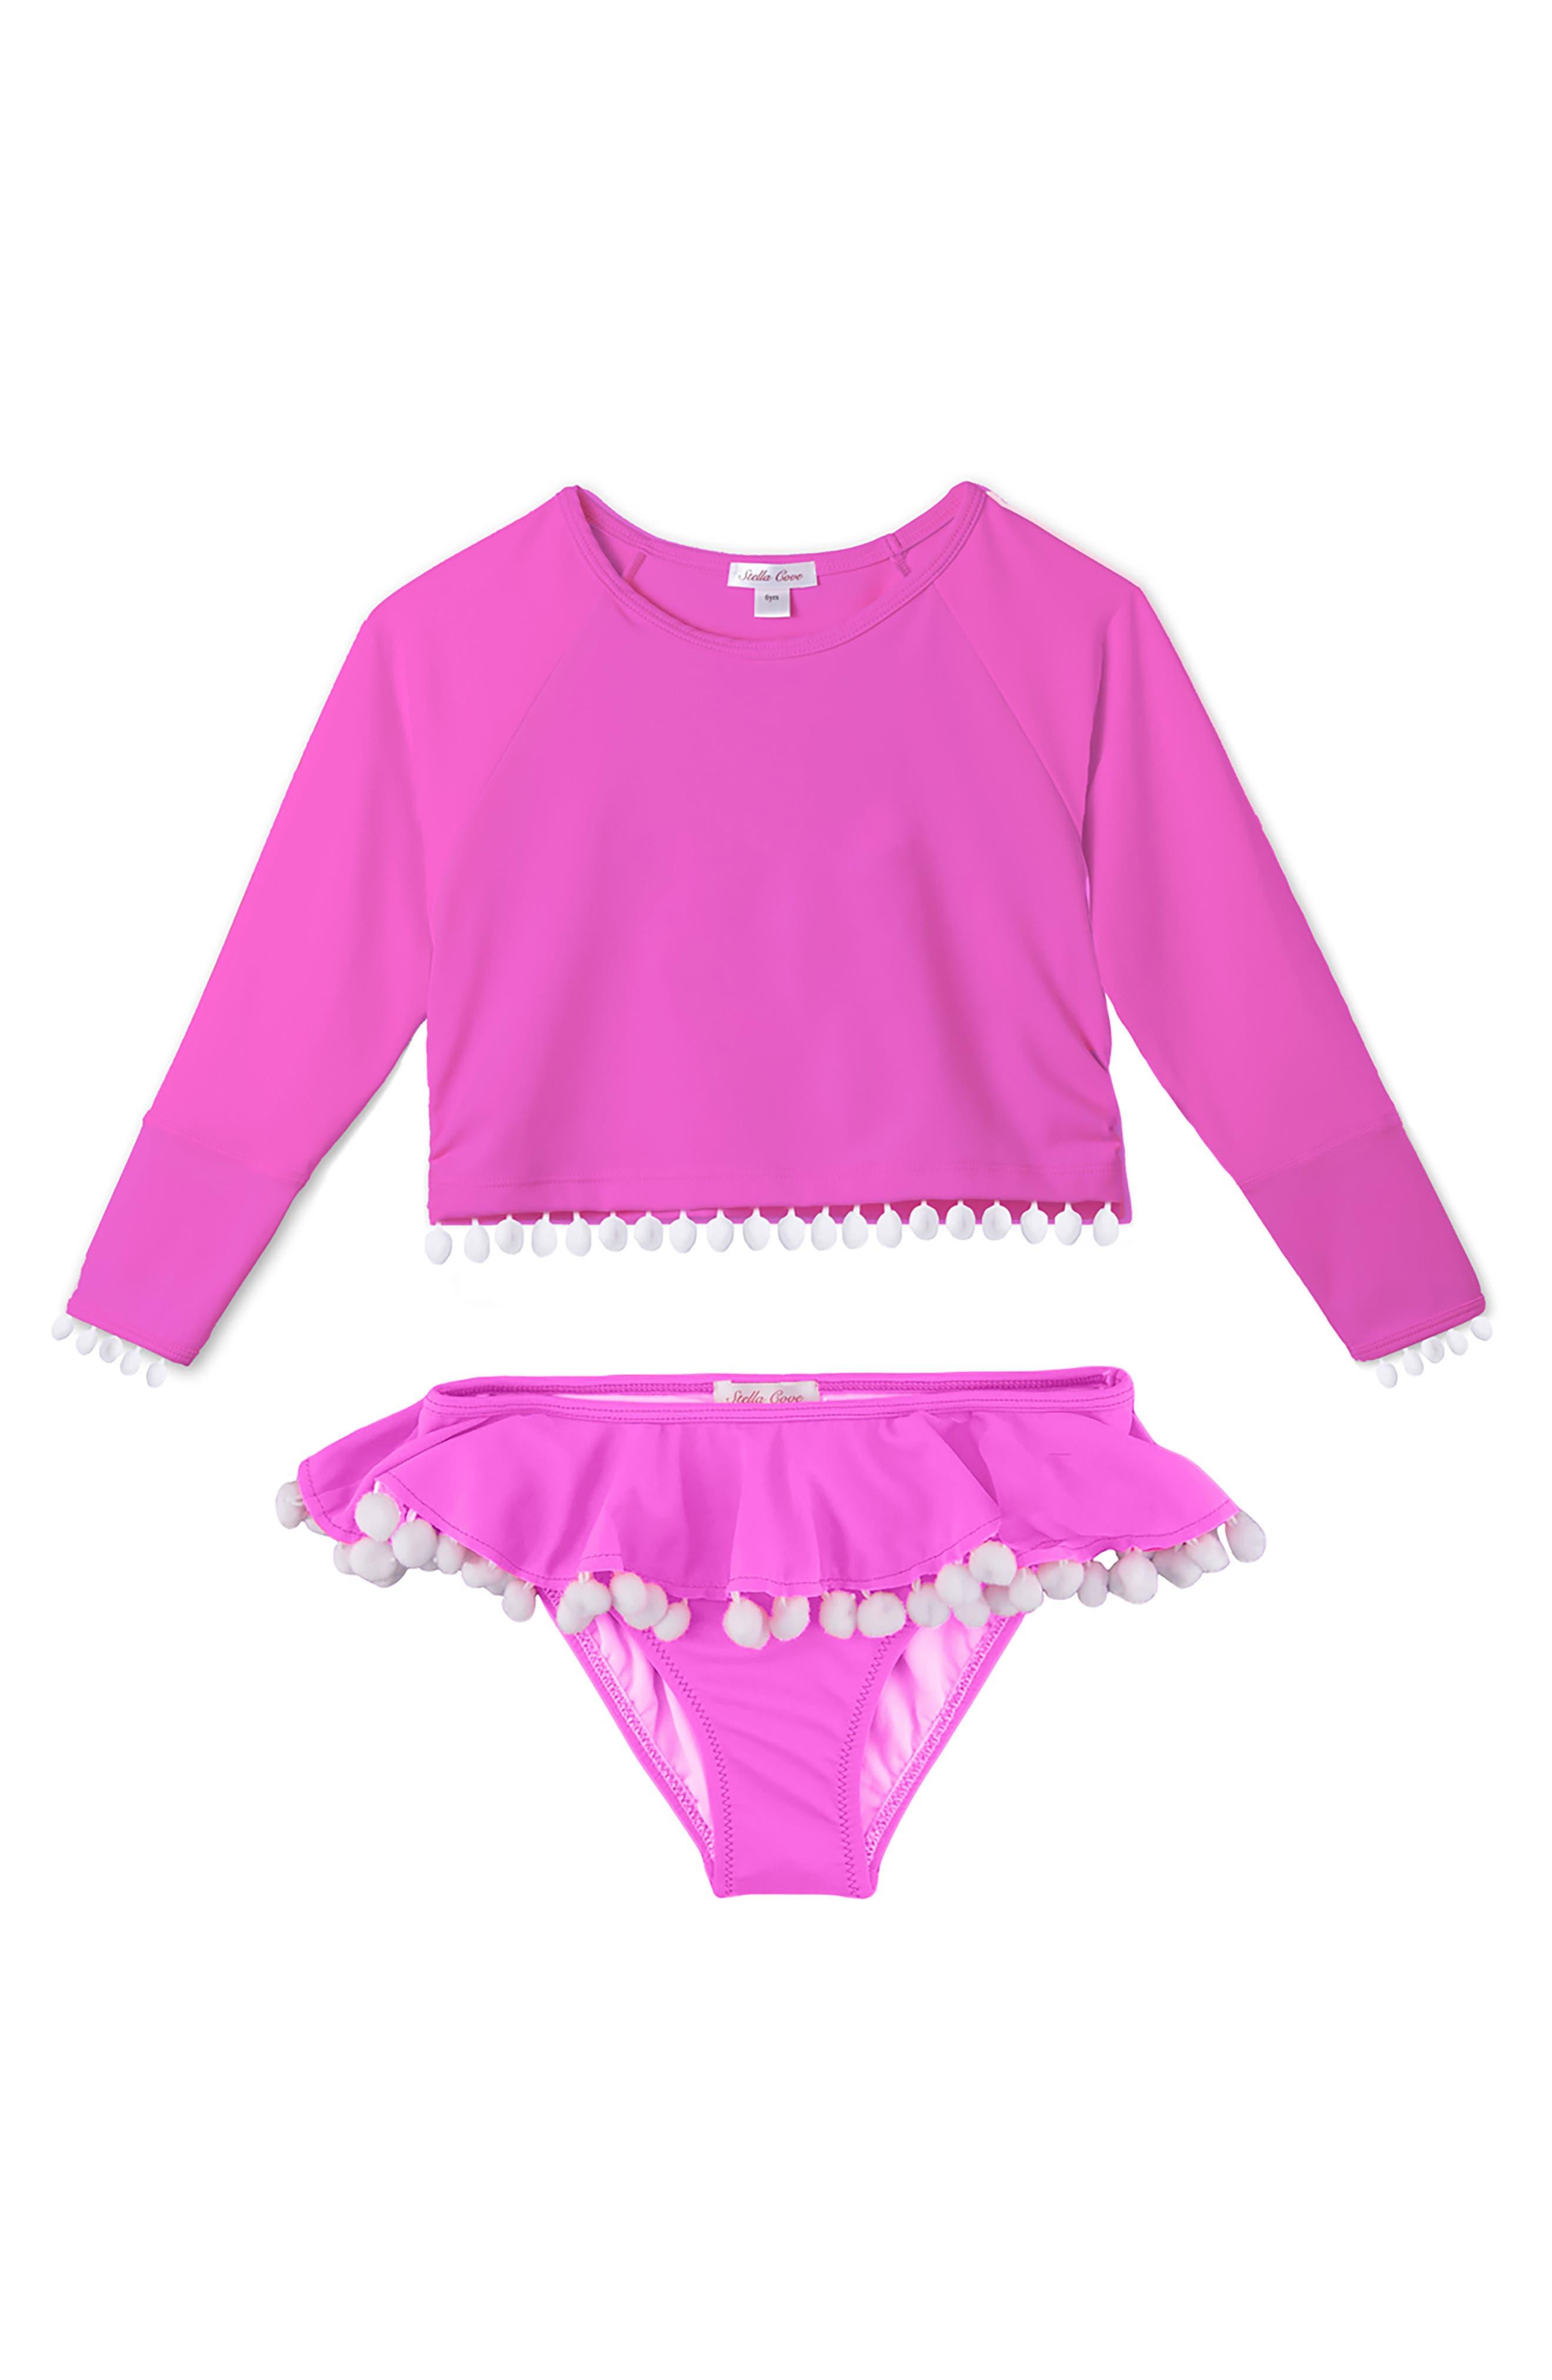 Pompom Rashguard Two-Piece Swimsuit,                         Main,                         color, Neon Pink